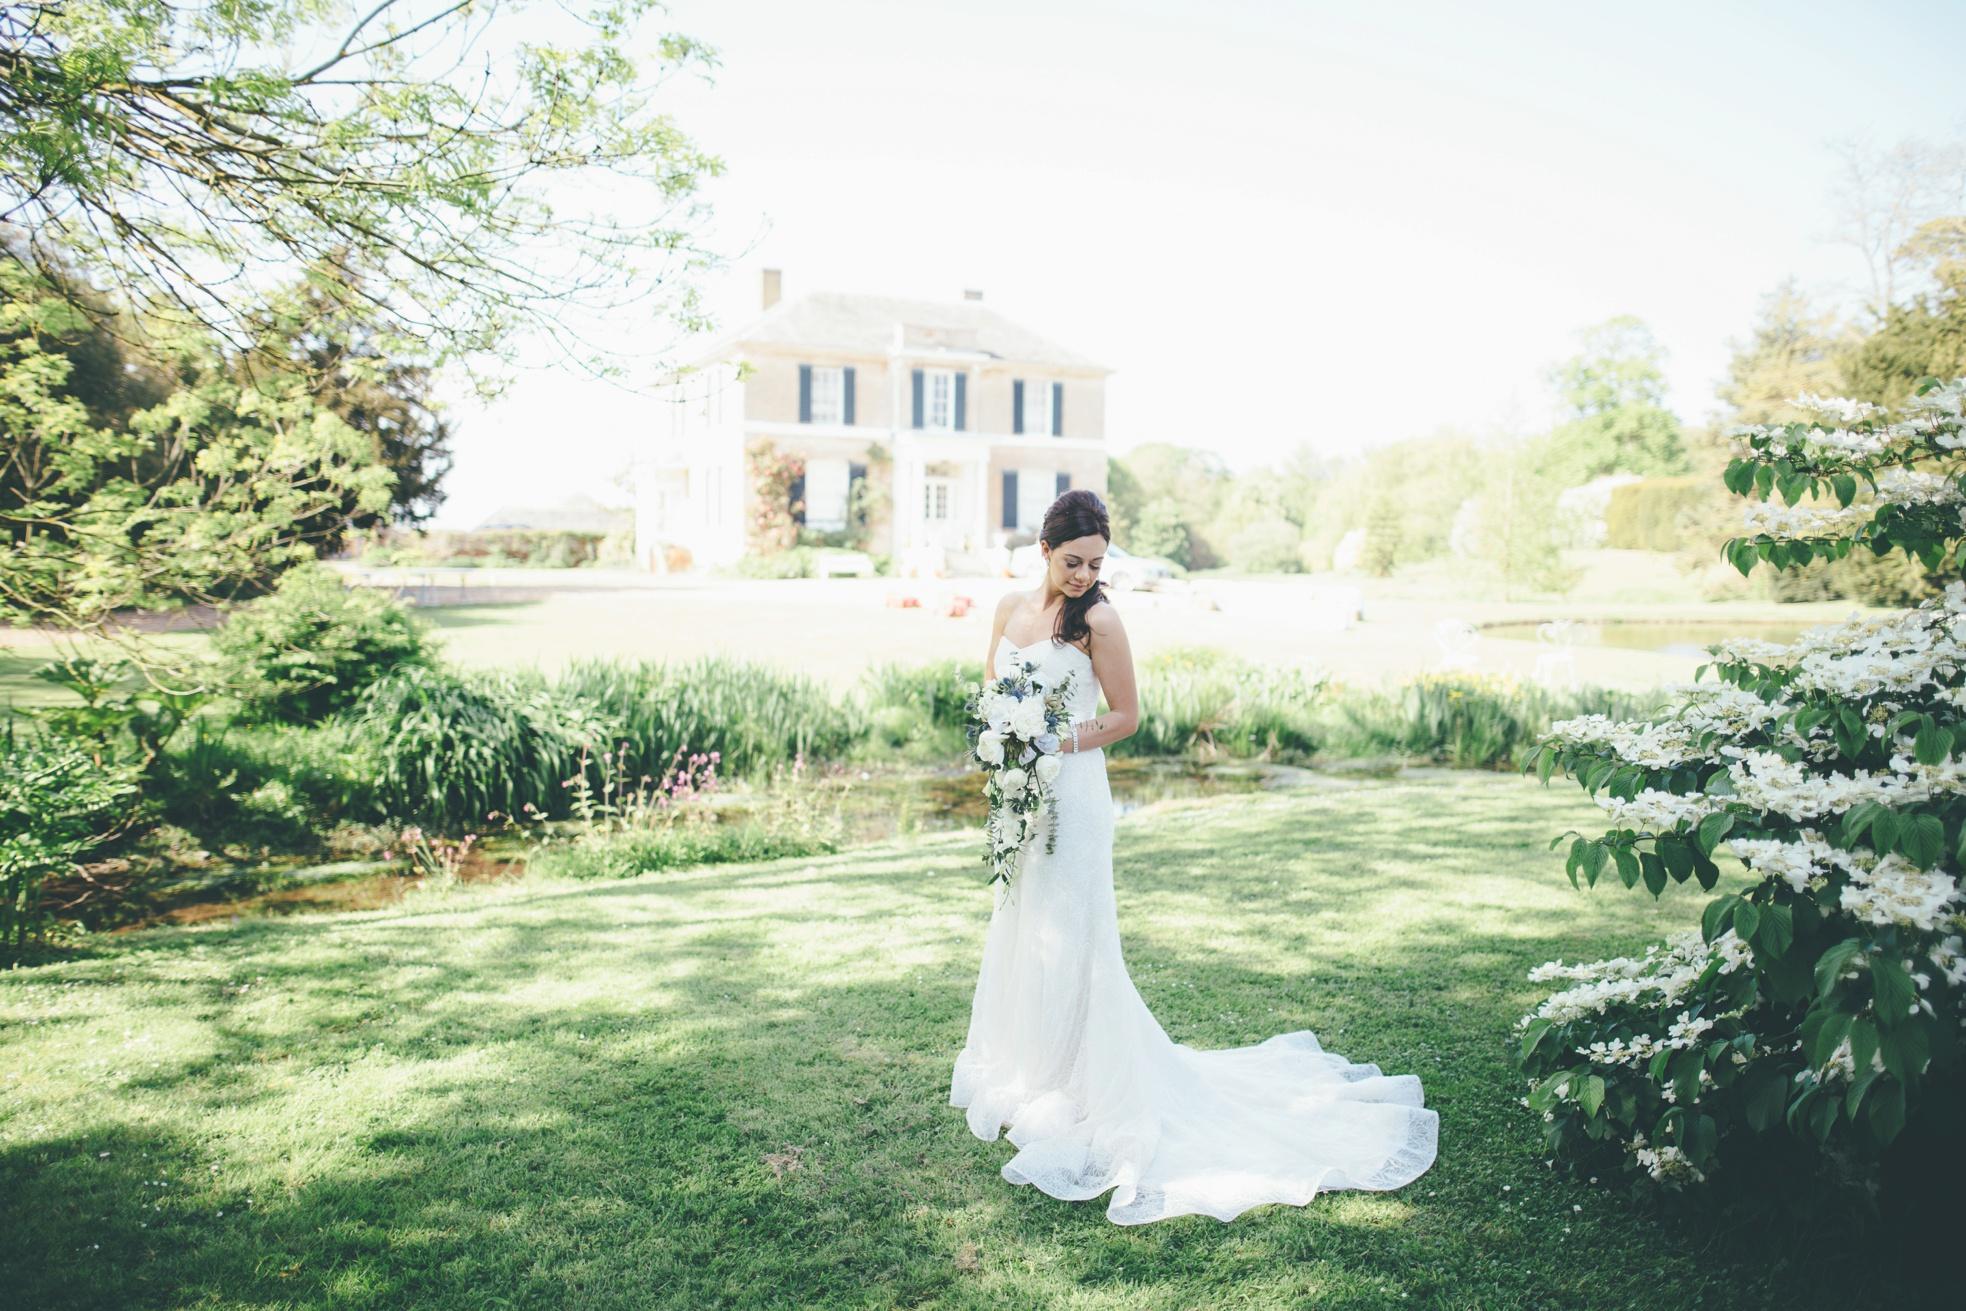 ClaireKieranwedding_PrestonCourtCanterbury_0022.jpg